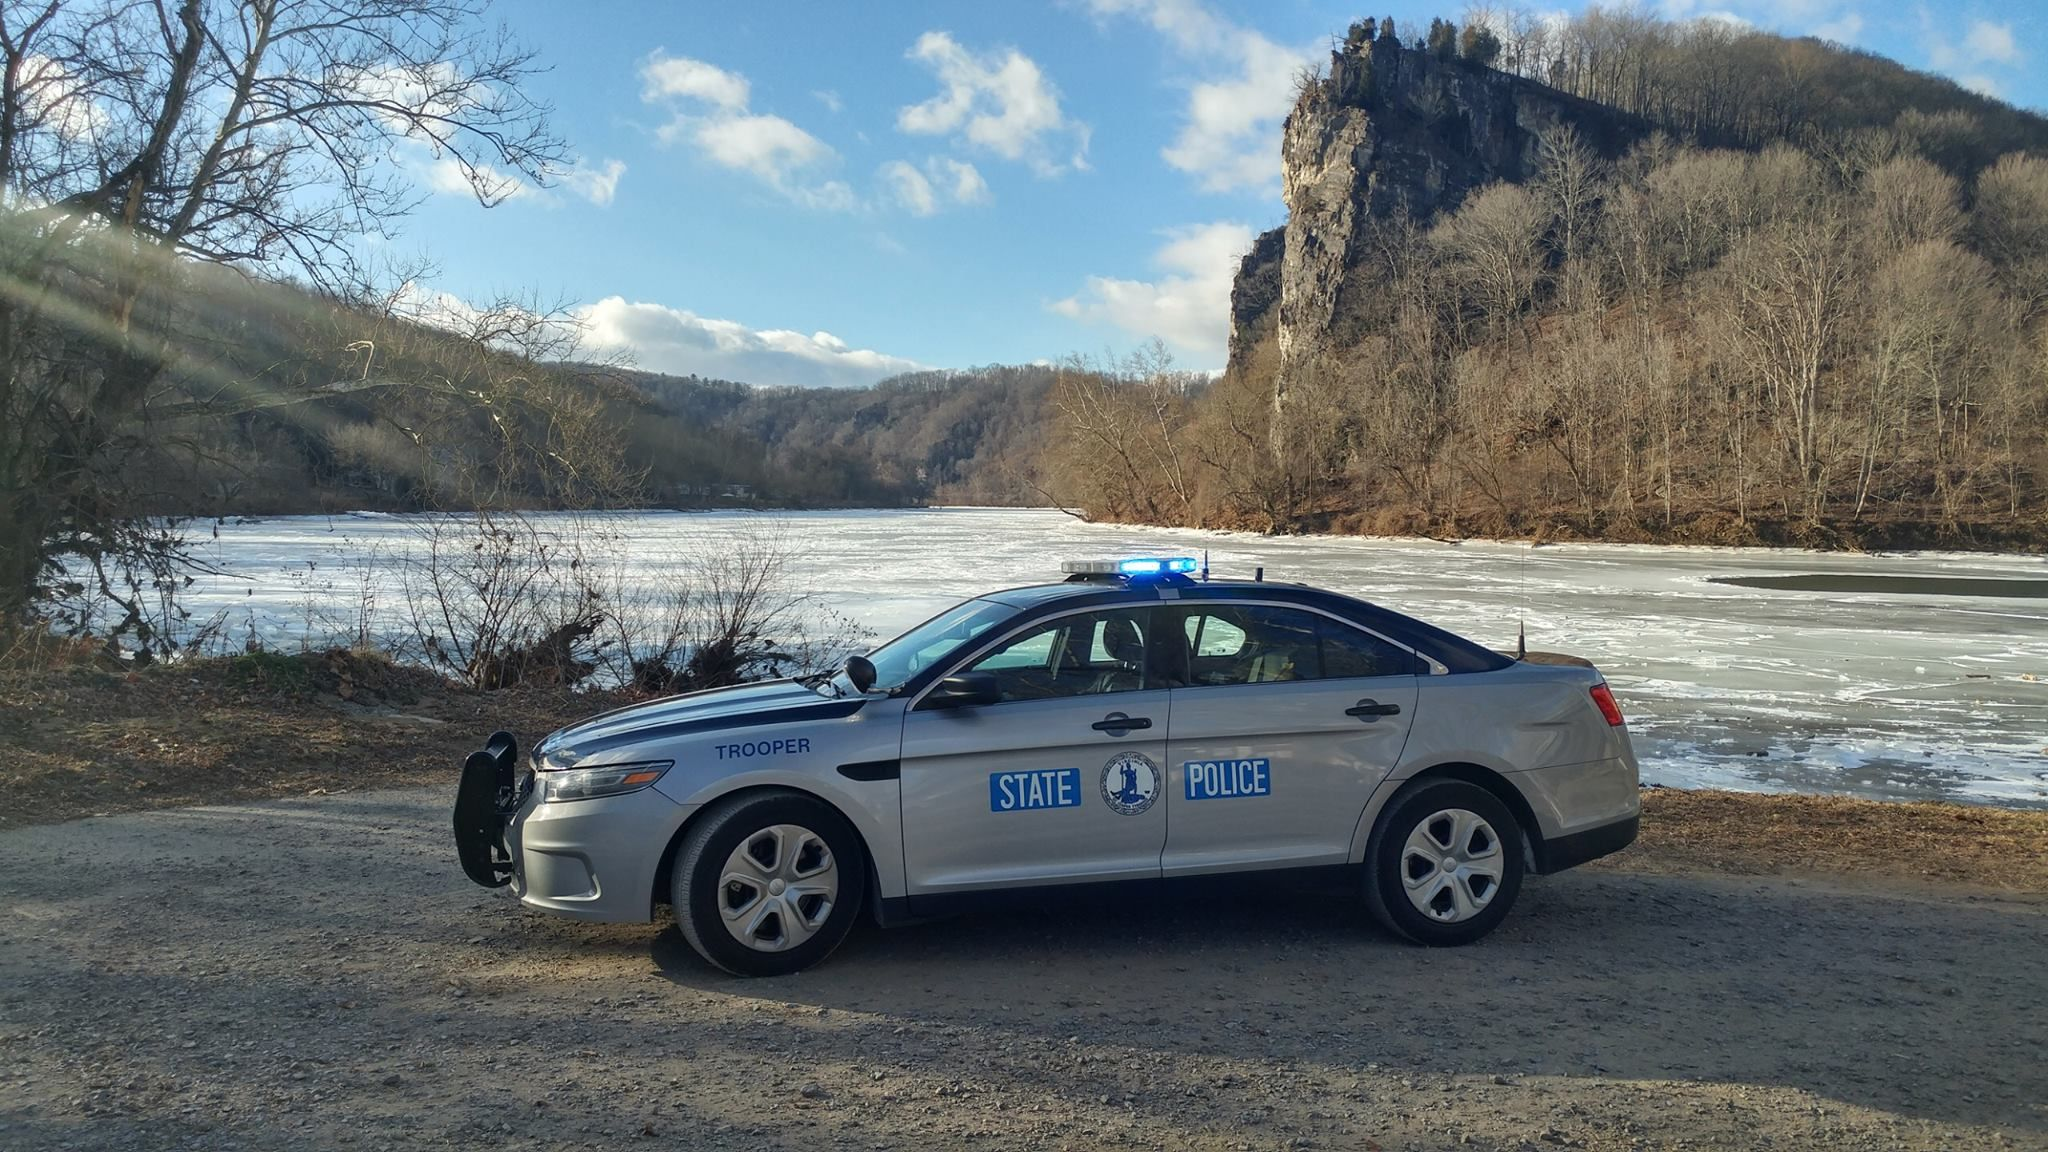 Virginia Virginia State Police Ford Interceptor Sedan Vehicle State Police Police Cars State Trooper